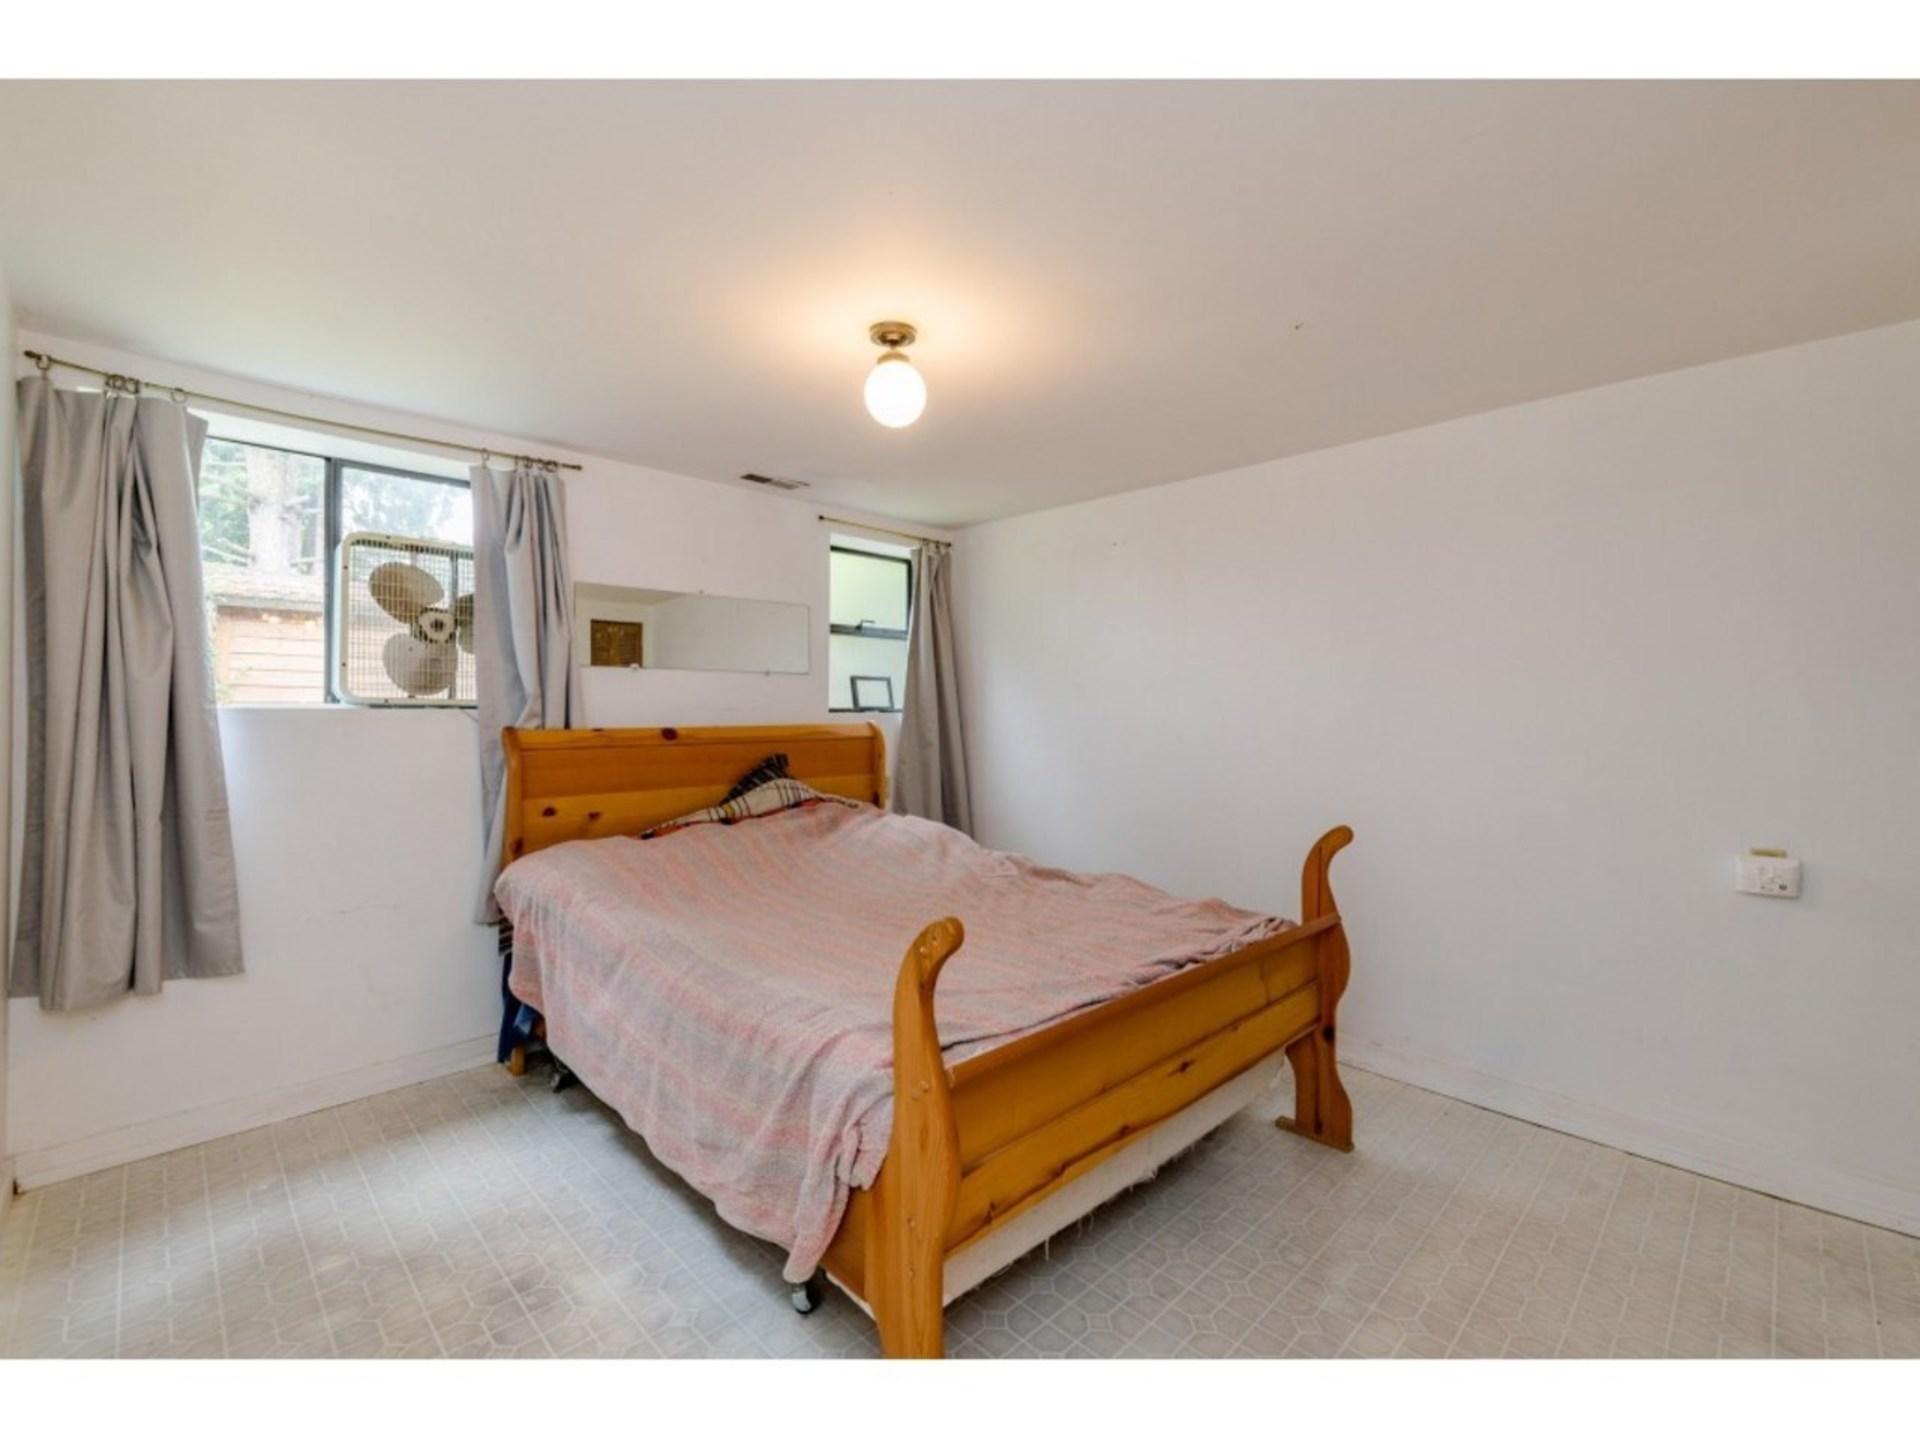 5771-172-street-cloverdale-bc-cloverdale-14 at 5771 172 Street, Cloverdale BC, Cloverdale